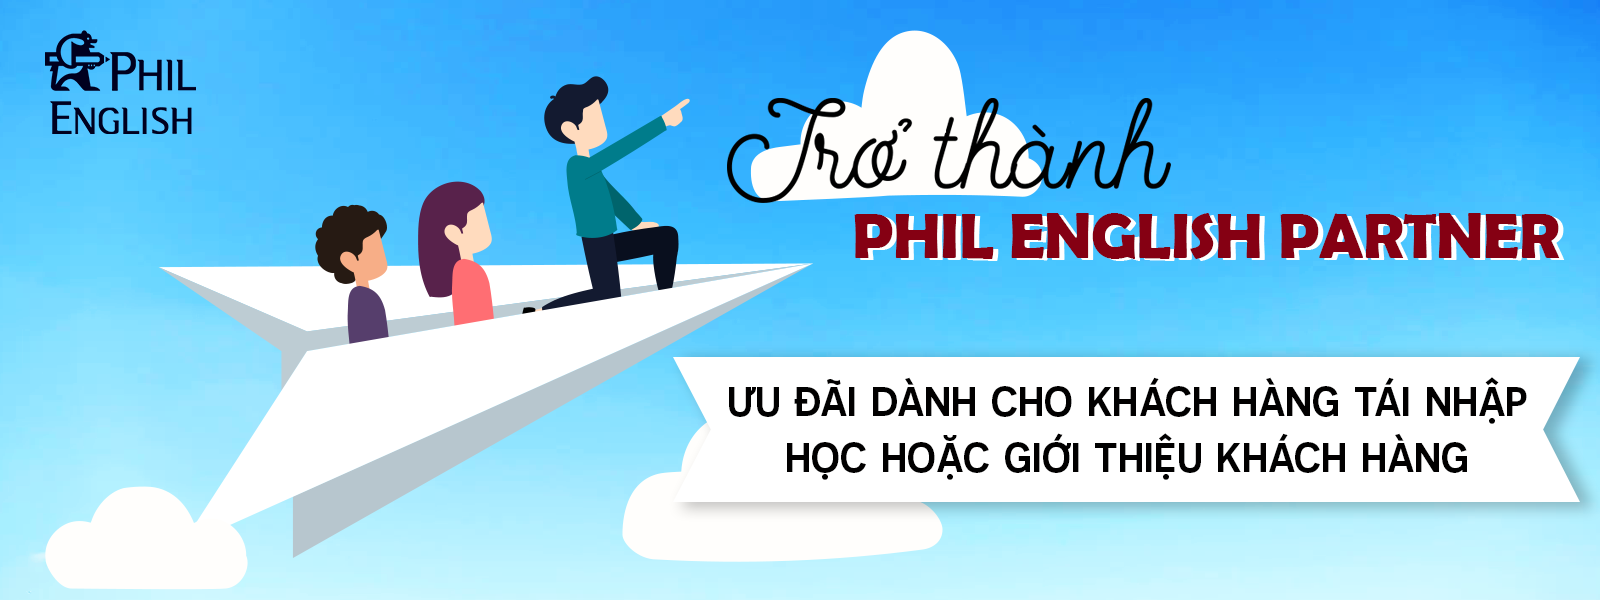 uu-dai-tu-phil-english